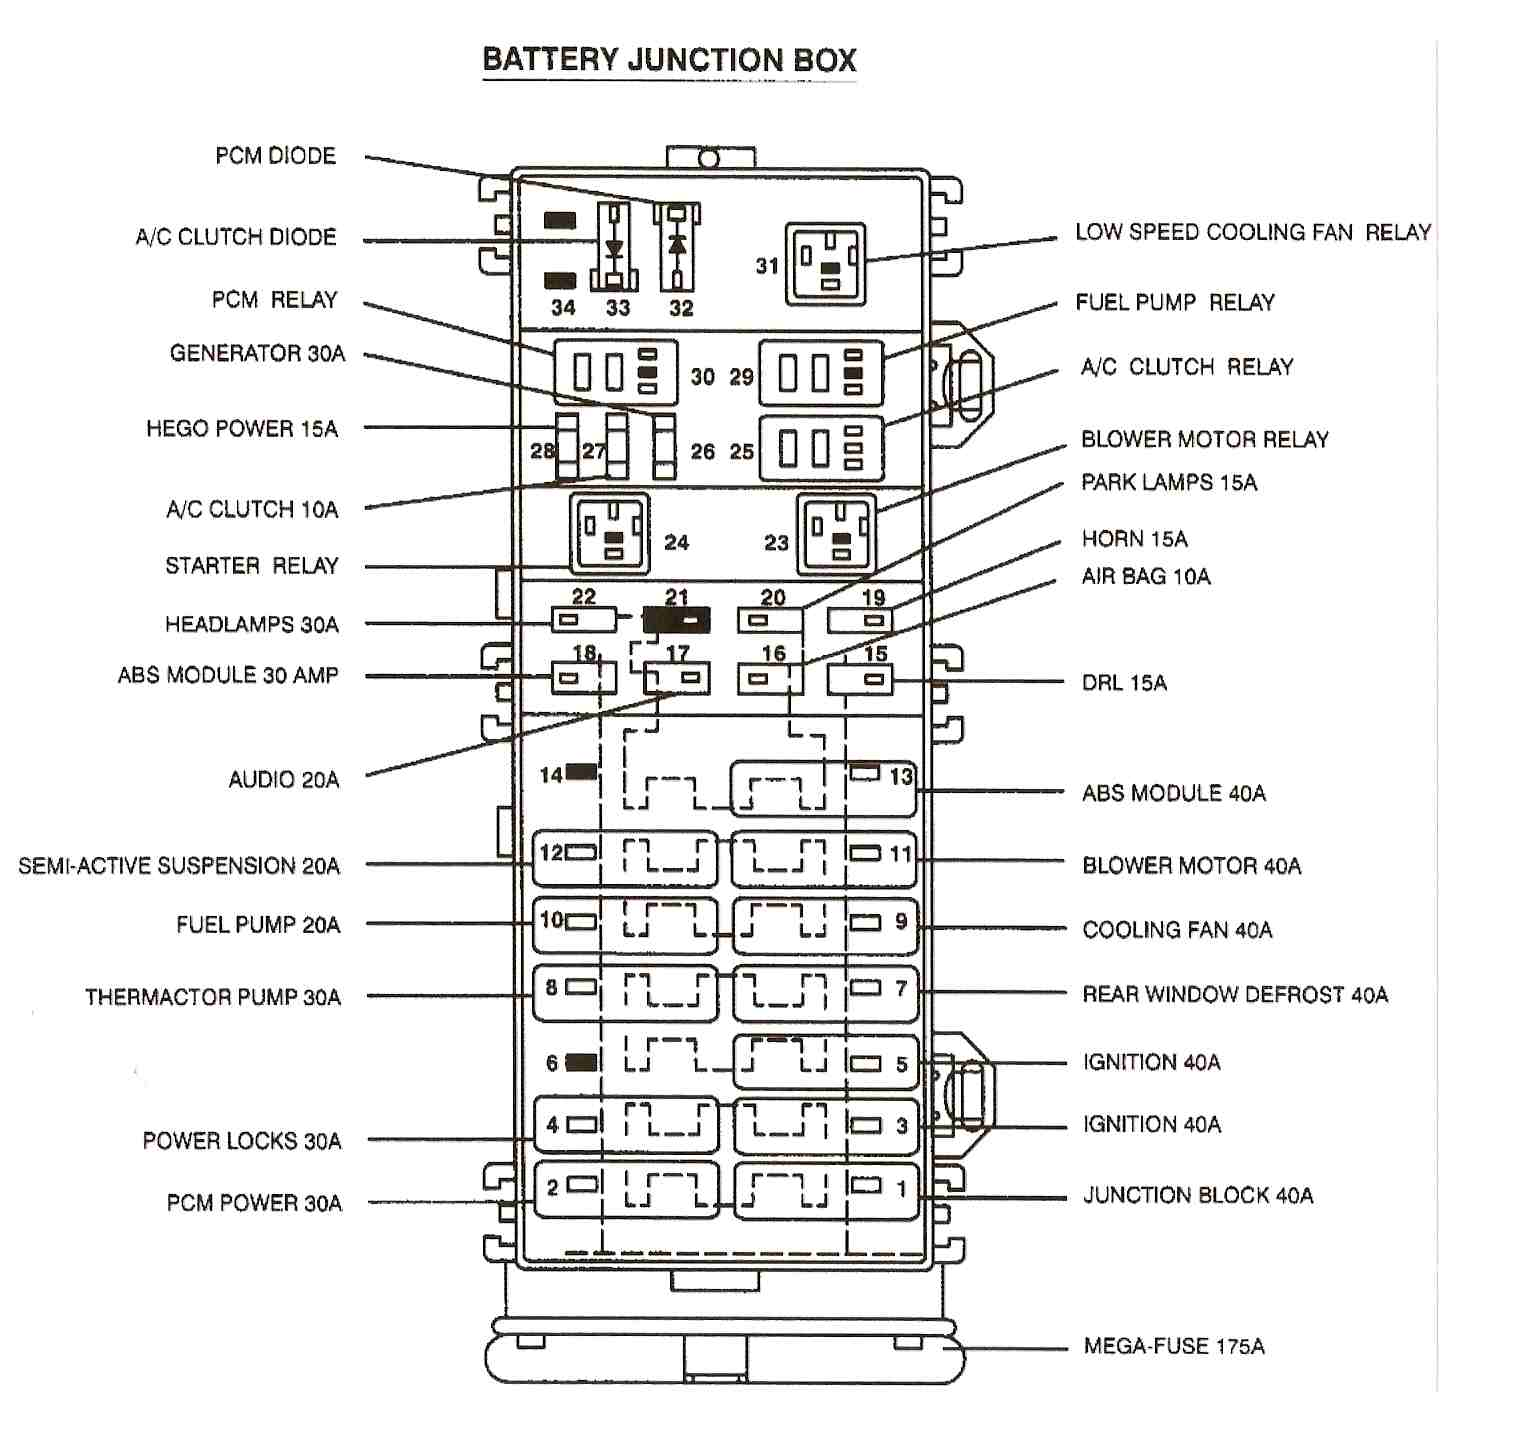 2000 Ford Taurus Fuse Box Diagram / Diagram 1991 Ford